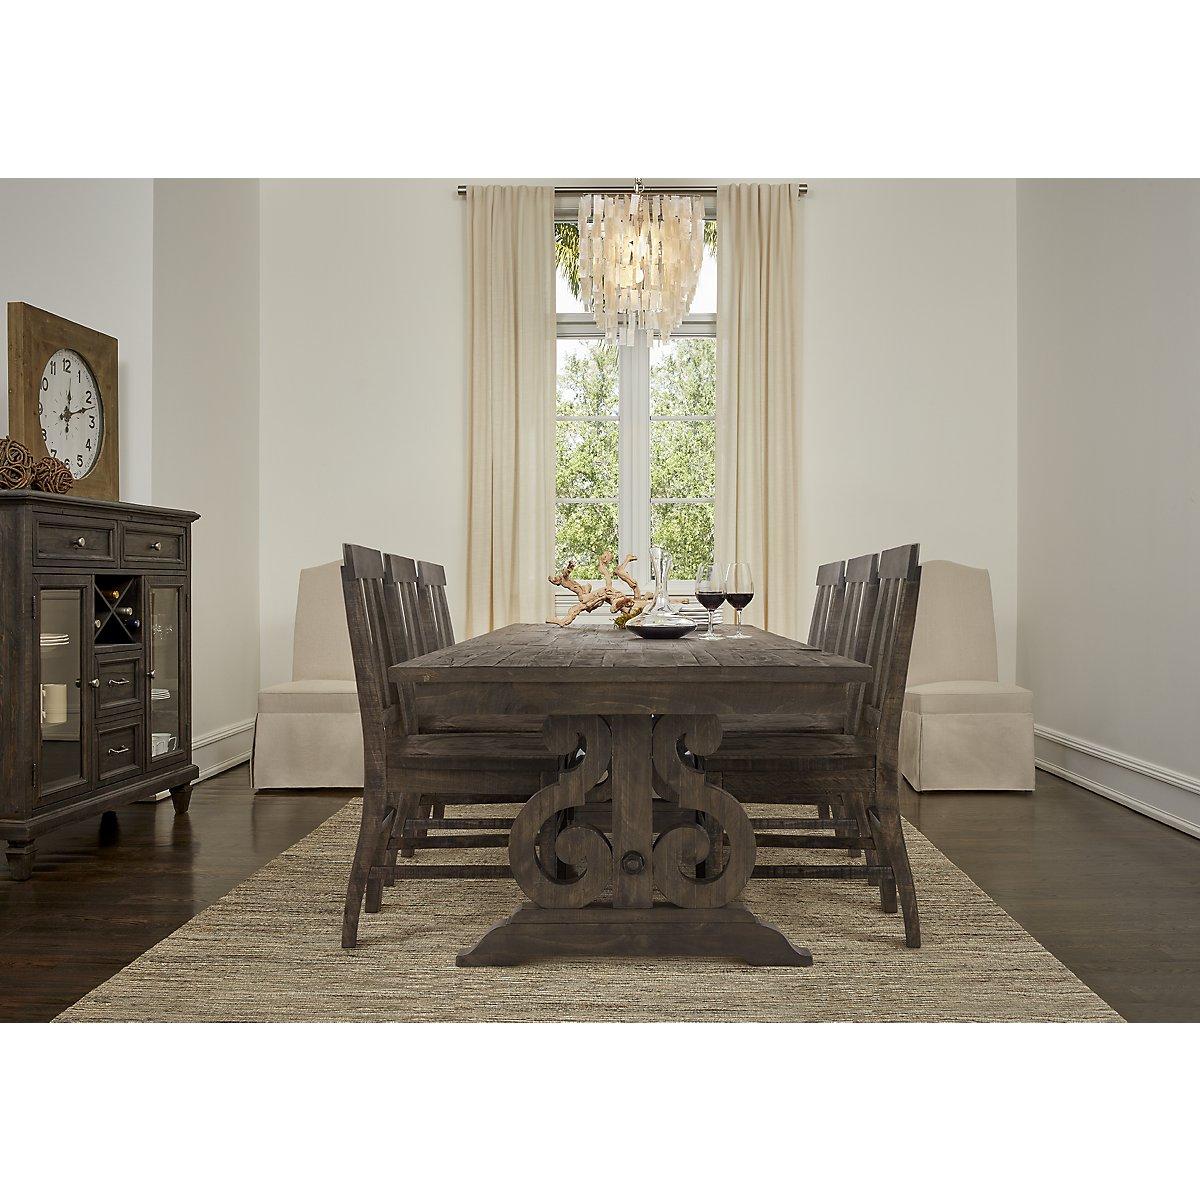 Sonoma Dark Tone Wood Dining Room